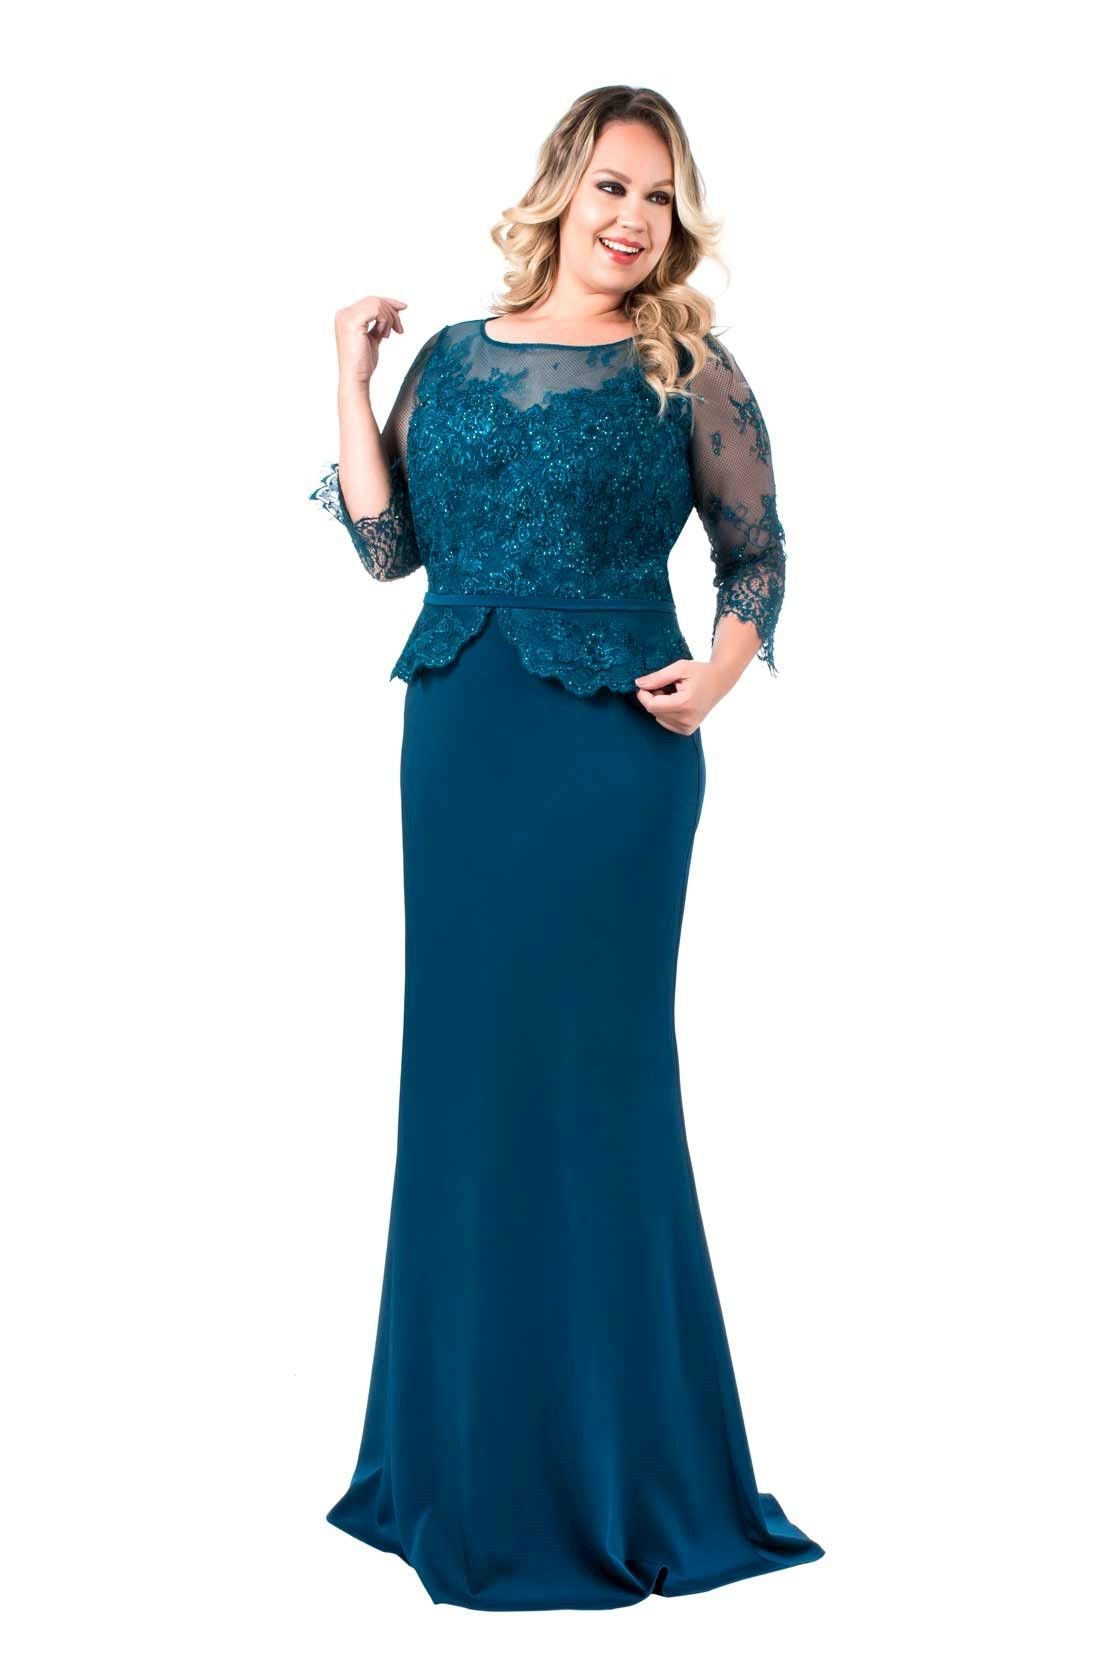 DRESSES - 3/4 length dresses Aries fCWfwjeaK